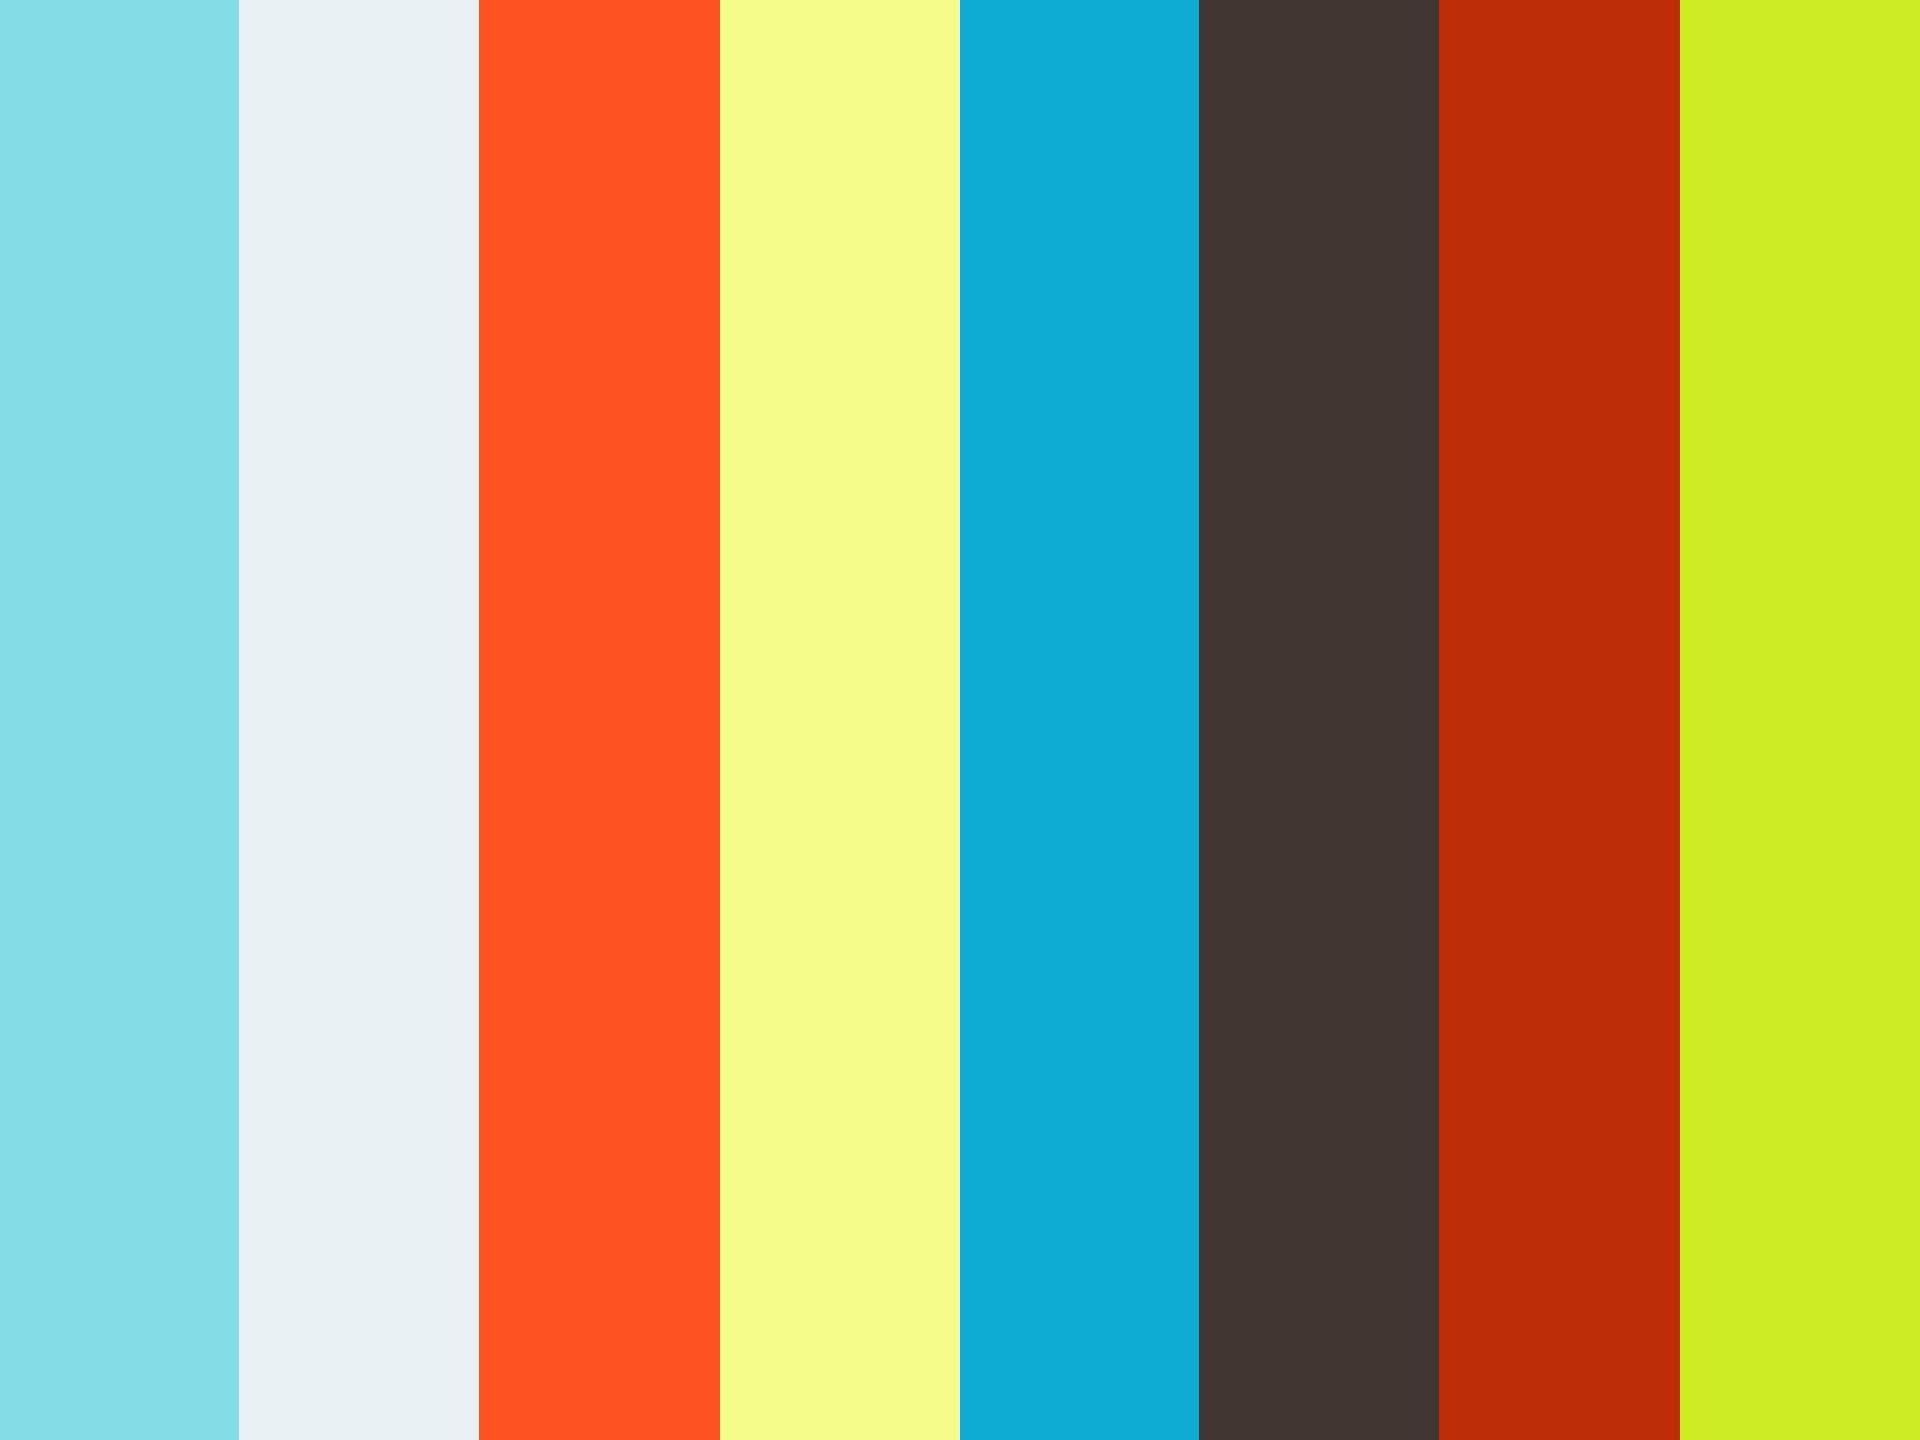 tjh0327~~倆忘煙水裡 港劇 天龍八部 主題曲 國語版 演唱 青山 張鴻~~tjh0327 on Vimeo